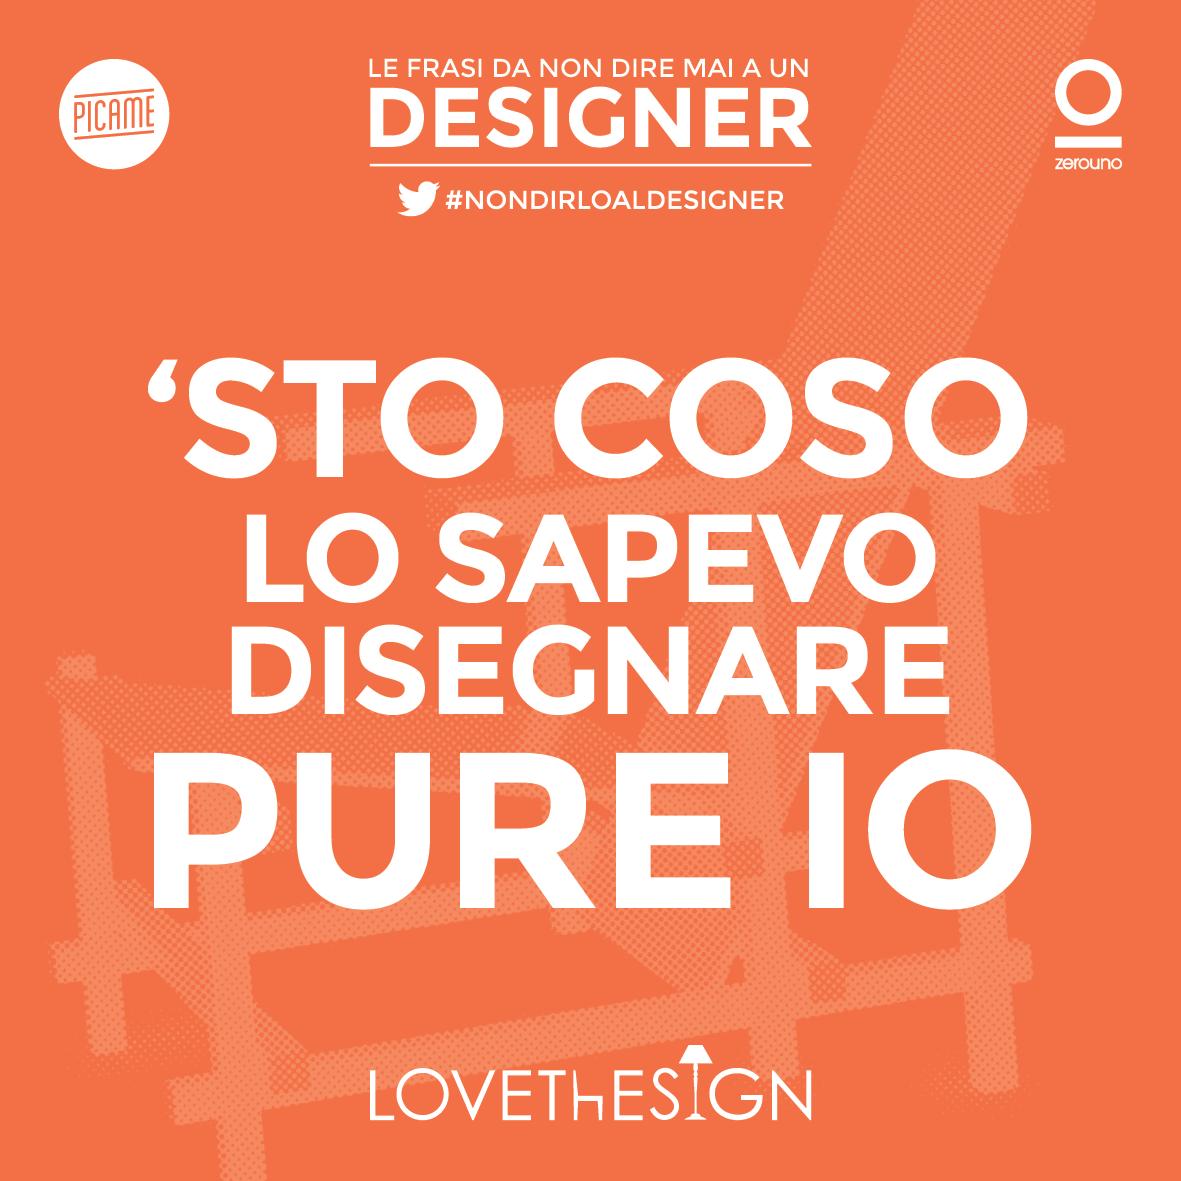 NonDirloalDesigner-Picame-Lovethesign-3